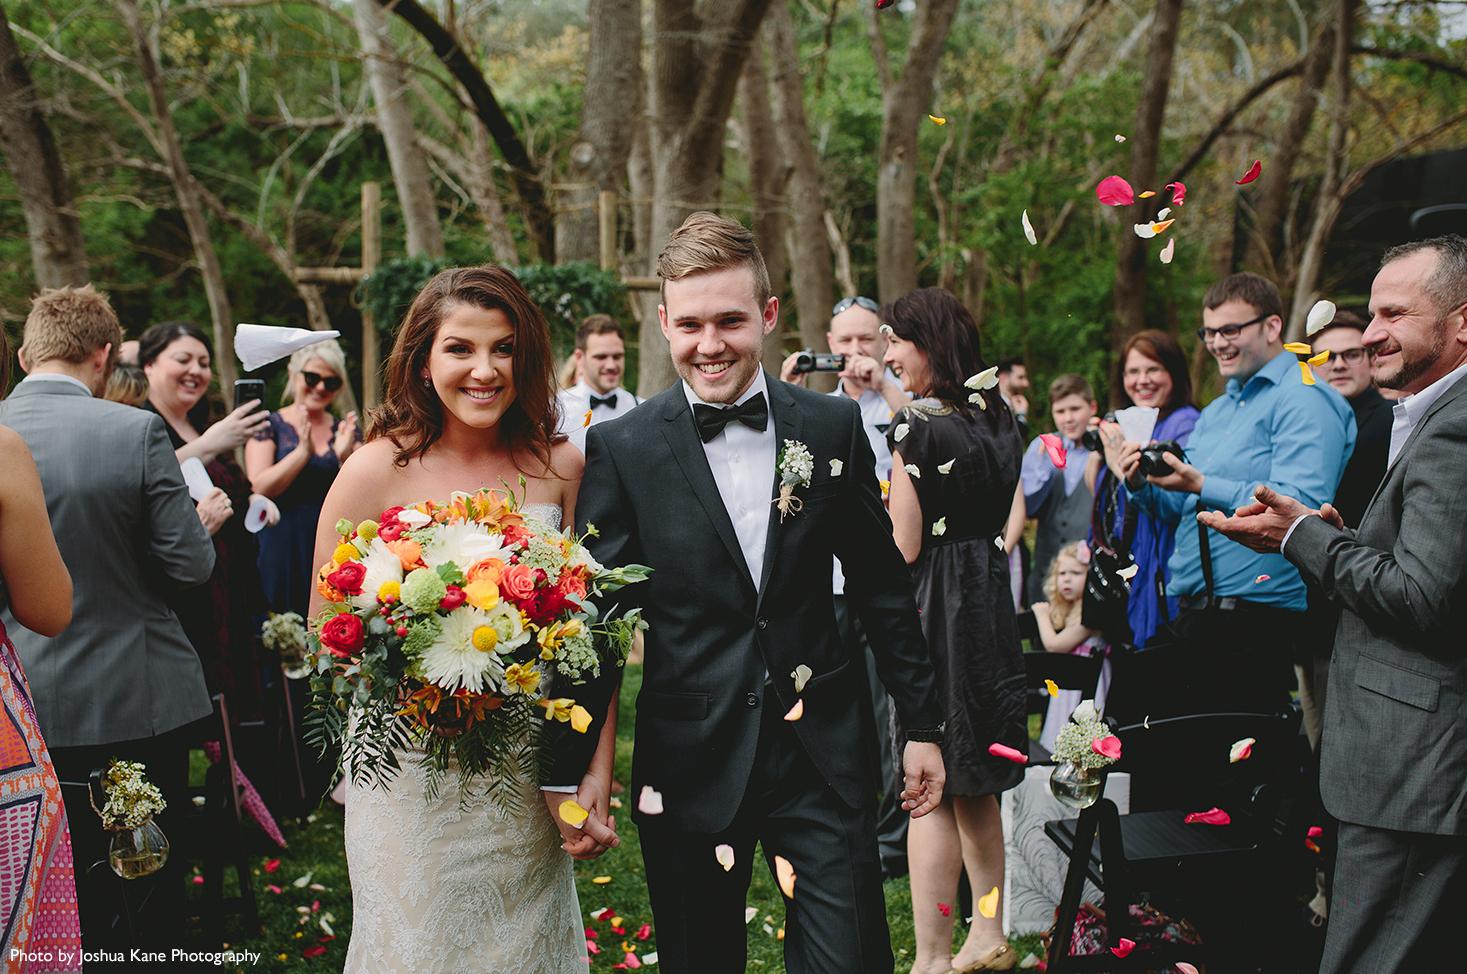 Wedding reception venues adelaide sa south australia - Inglewood Inn Weddings Ceremony Reception Venue Adelaide Hills South Australia Inglewood Inn Weddings Ceremony Reception Adelaide Hills